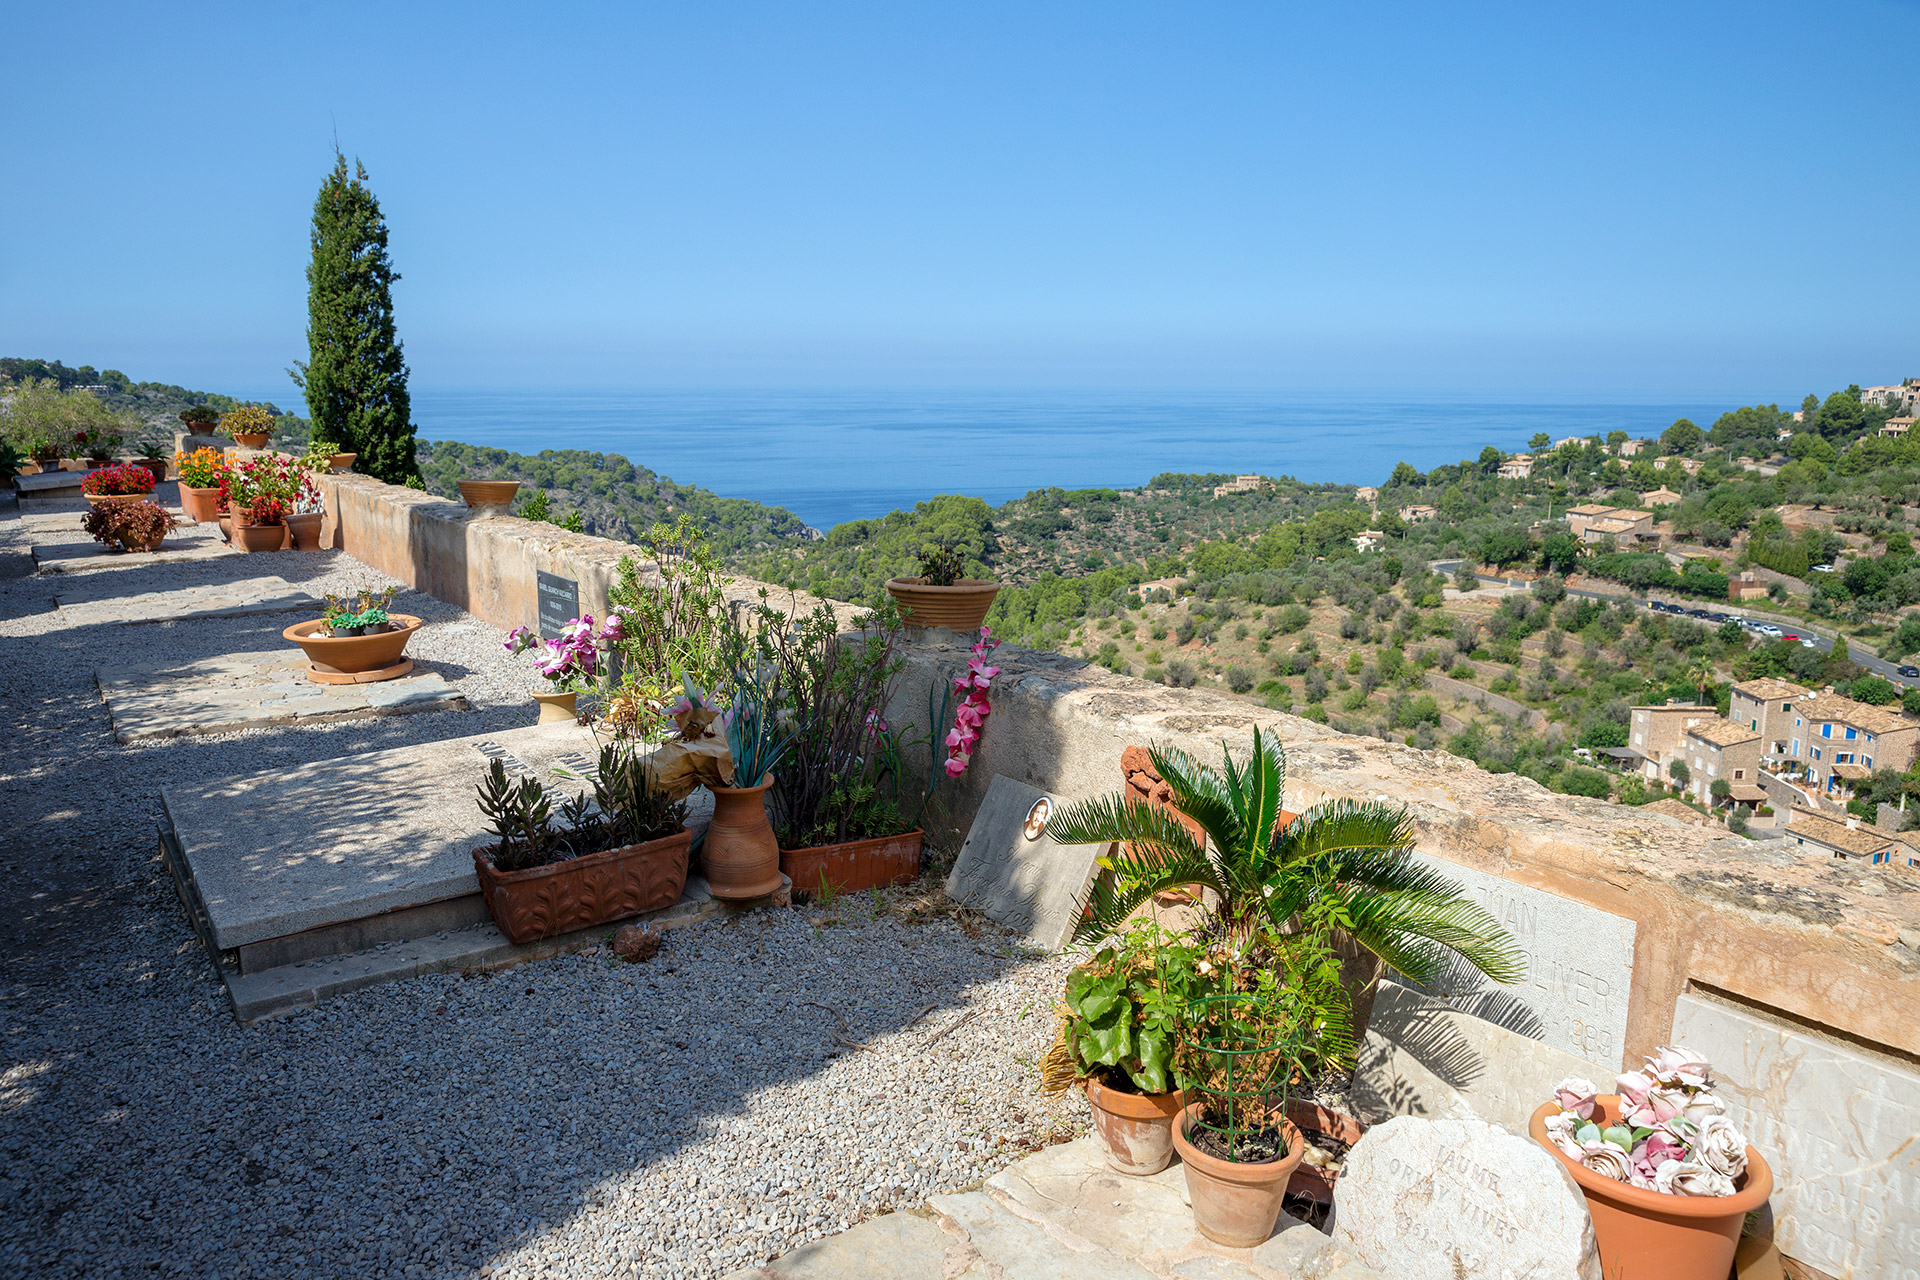 Cala Deià, Mallorca © Tuulia Kolehmainen